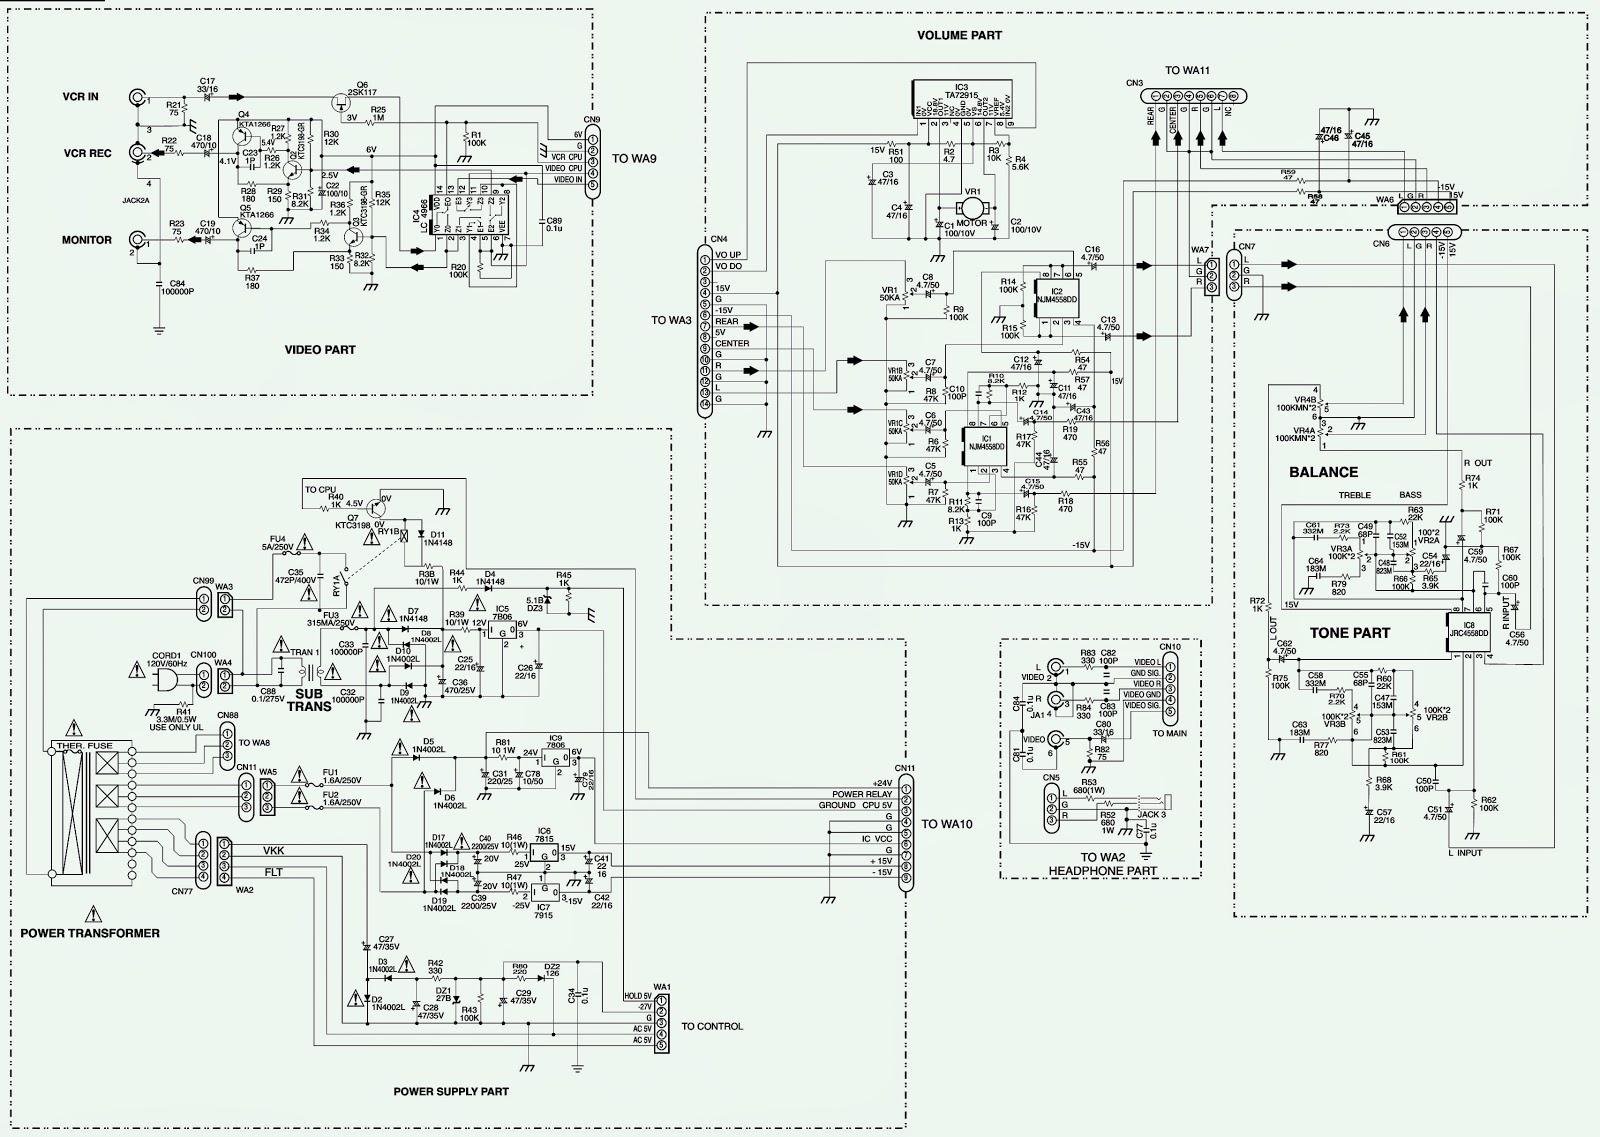 Jeep Jk Sub Wiring Diagram For Relay Spotlights Wrangler Subwoofer Imageresizertool Com